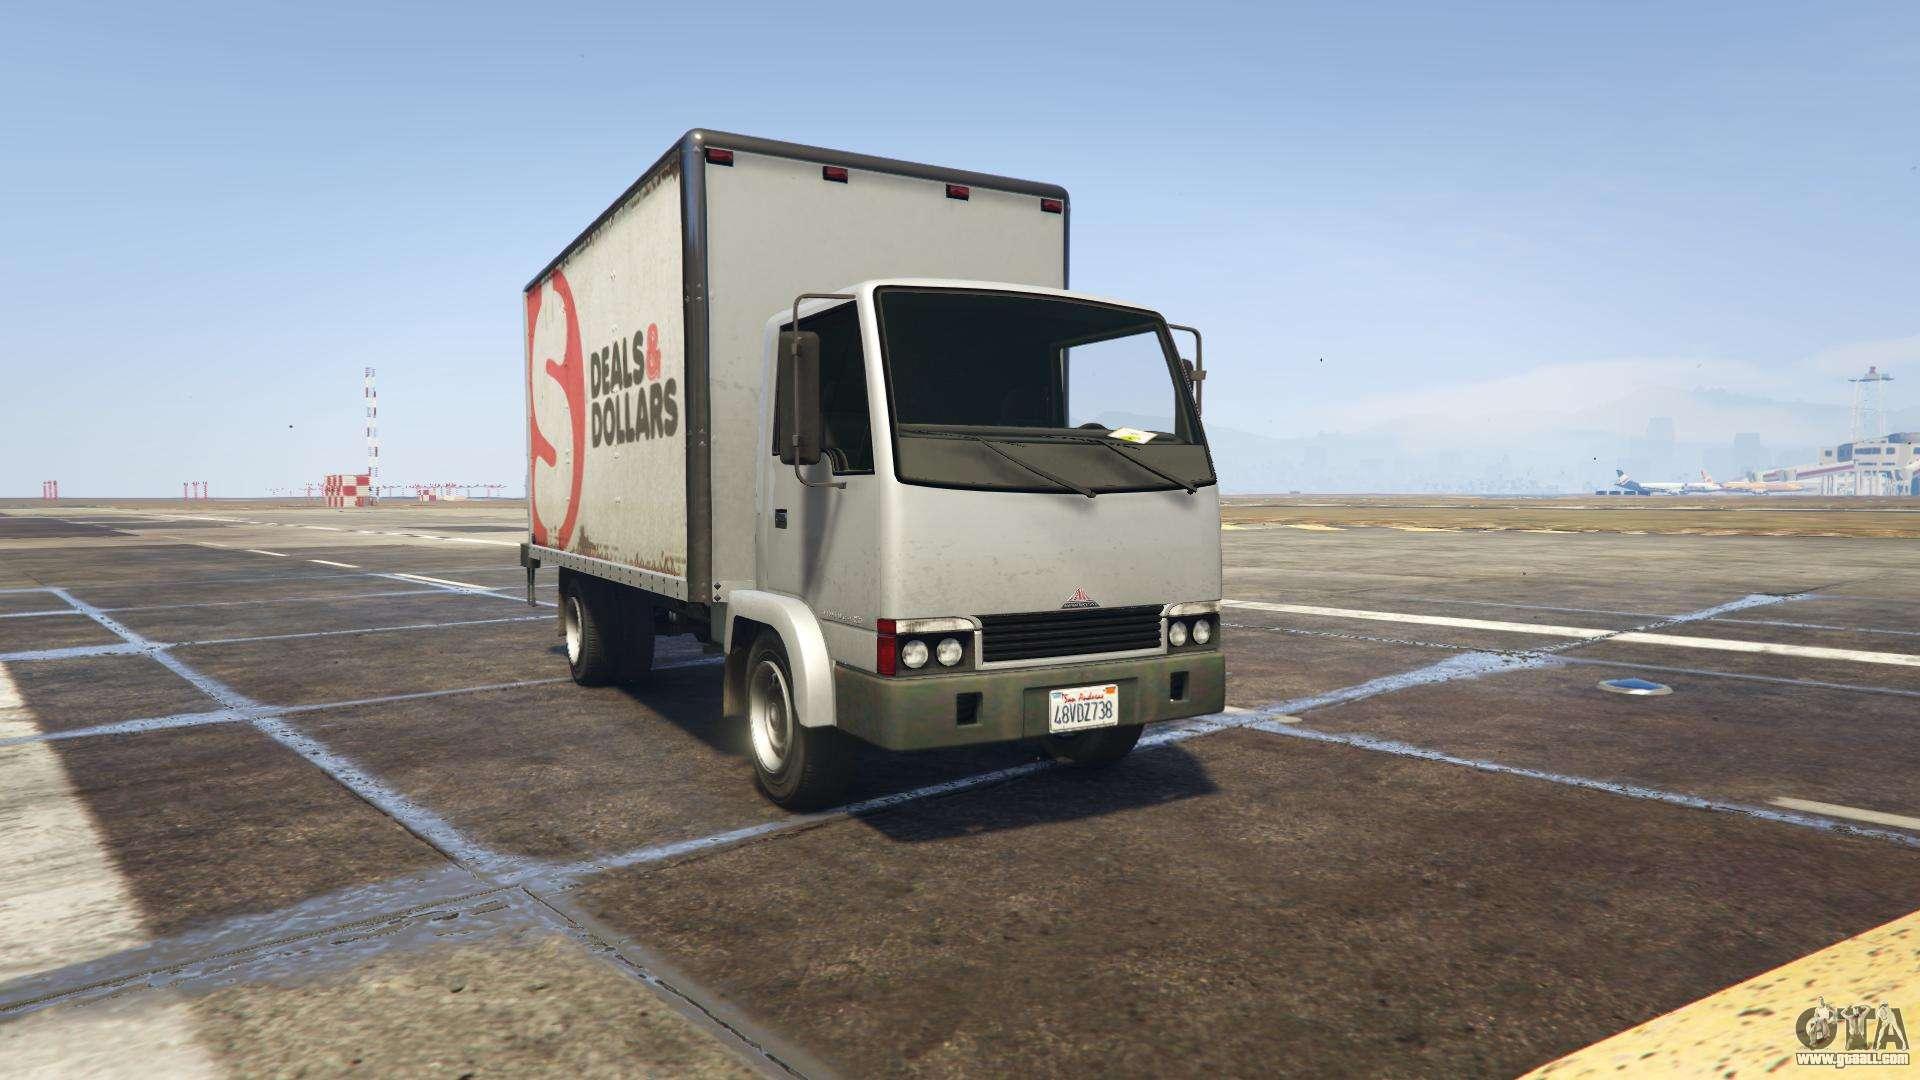 gta 5 maibatsu mule screenshots features and description of the truck. Black Bedroom Furniture Sets. Home Design Ideas